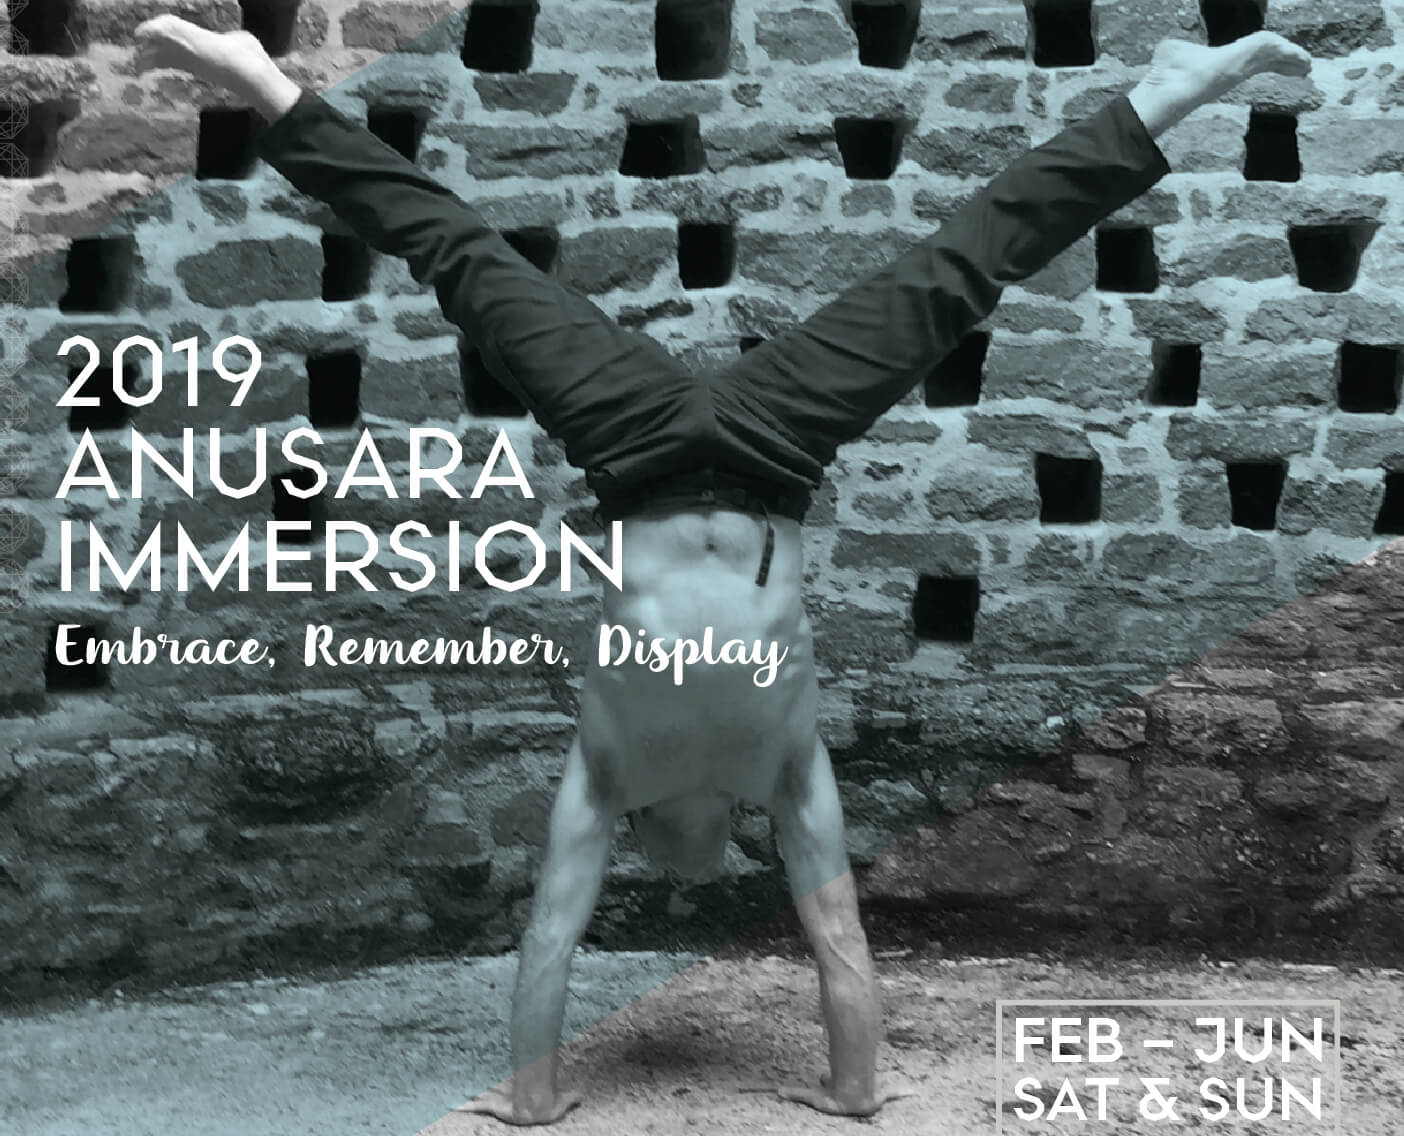 2019 Anusara Immersion